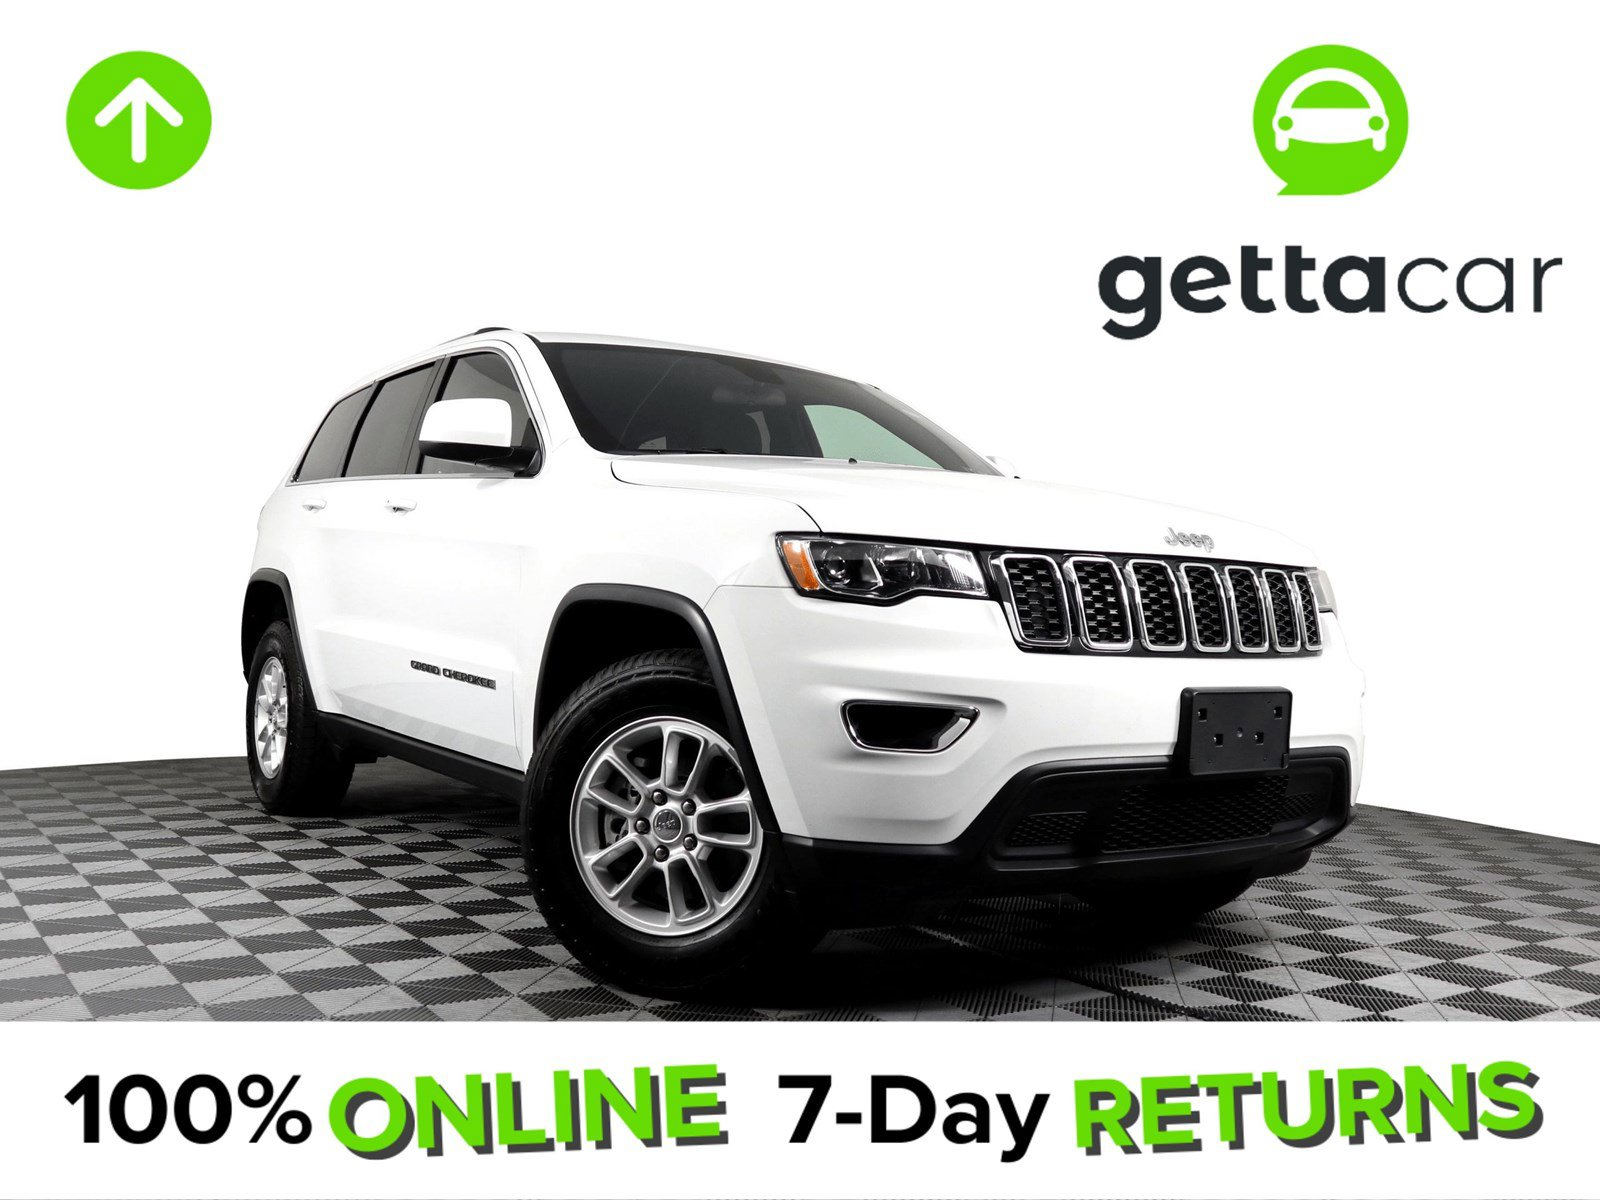 2018 Jeep Grand Cherokee 4WD Laredo image